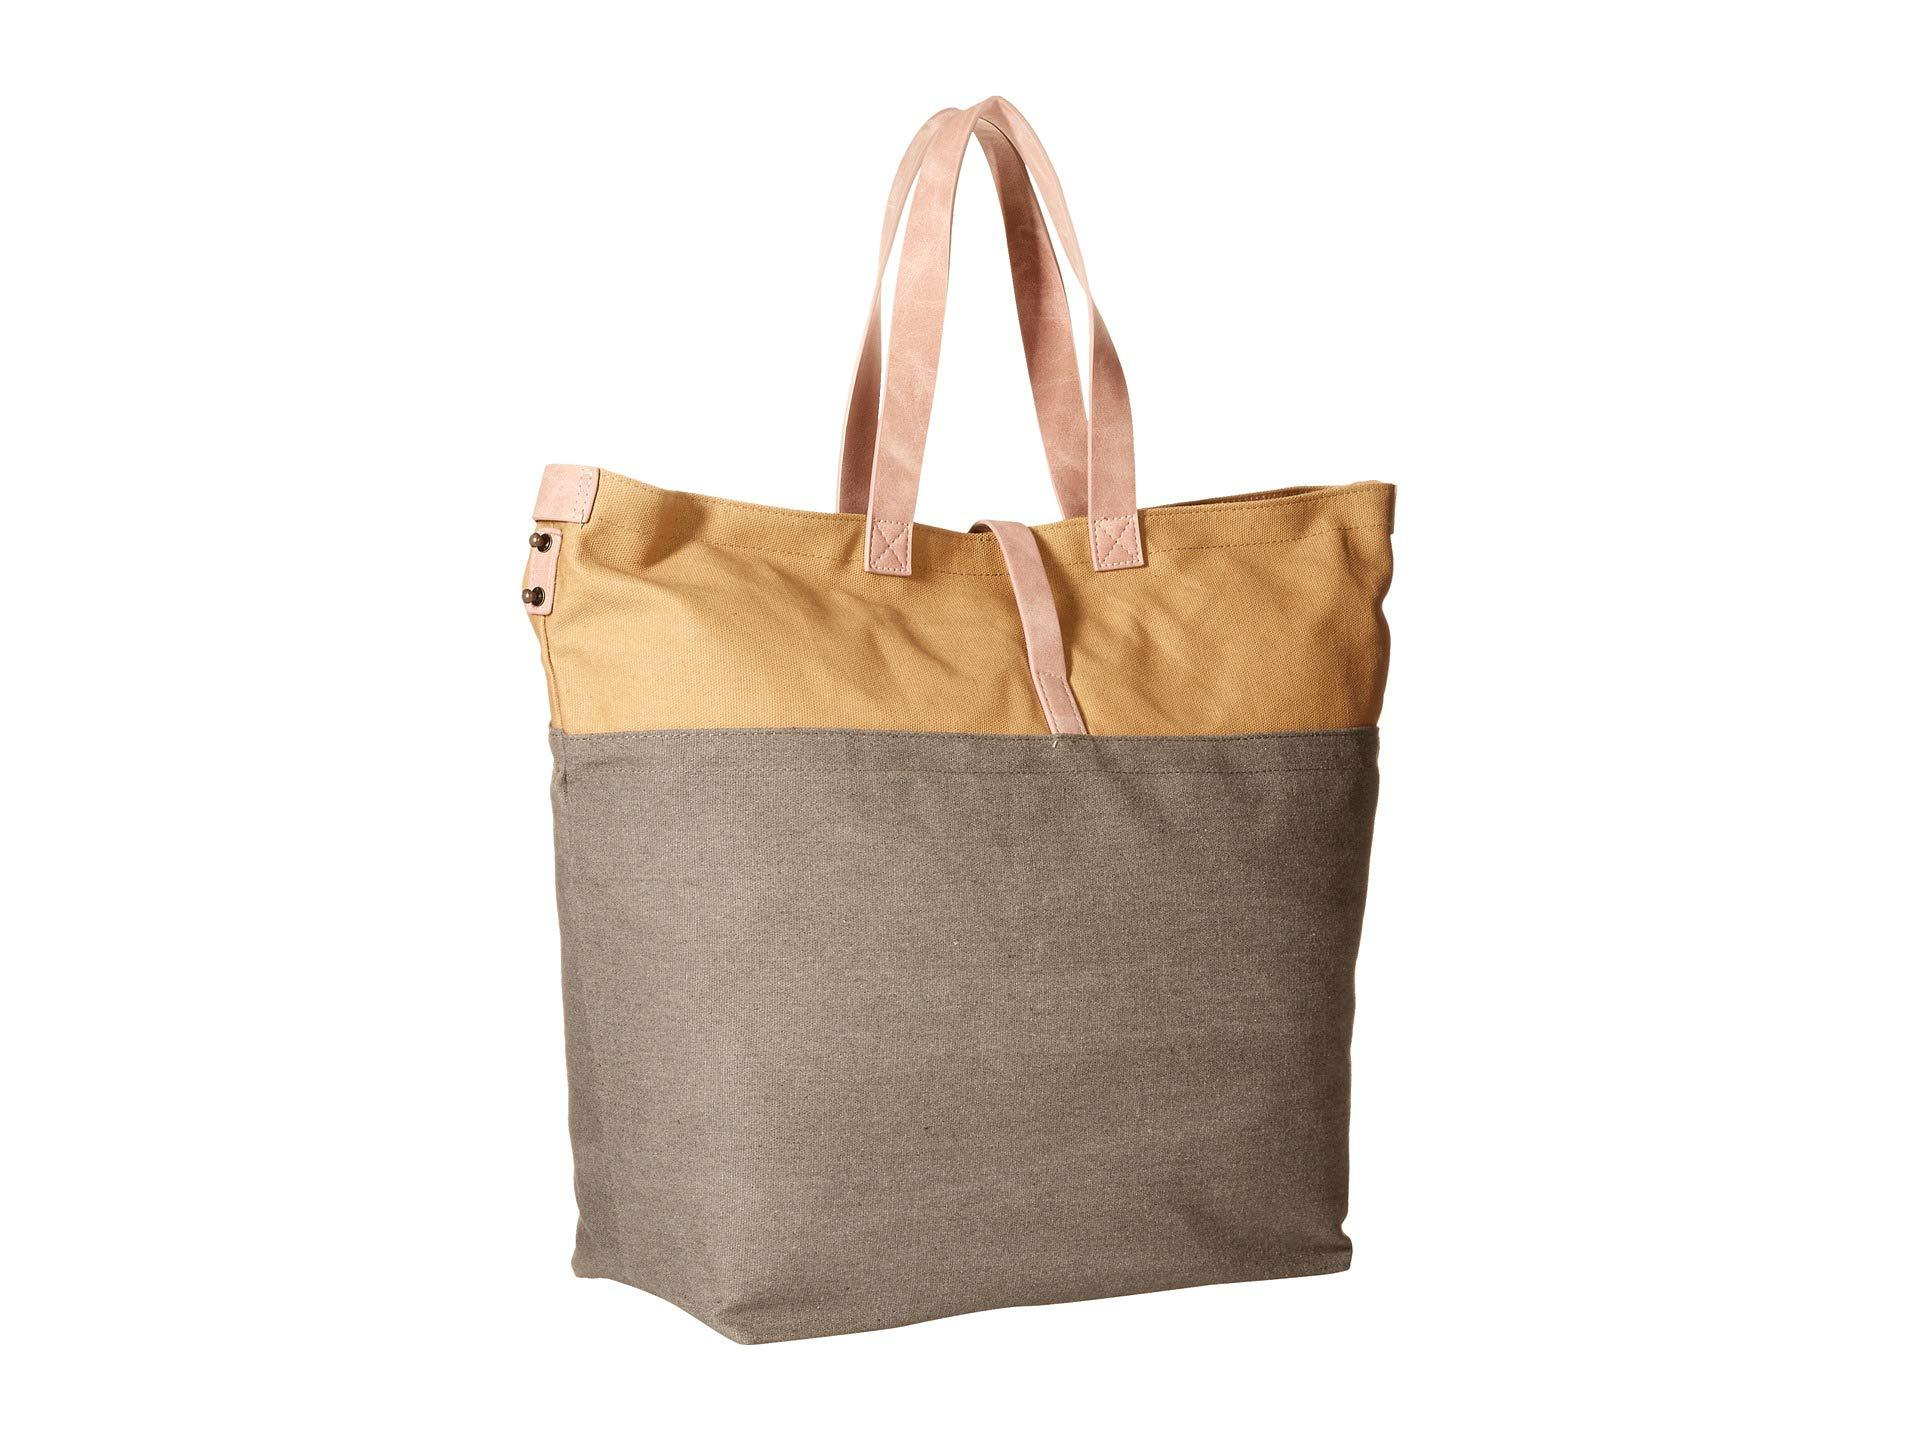 Lyst - Roxy Stripey Love Large Tote Bag (turbulence) Cross Body Handbags 8671e7514cf03